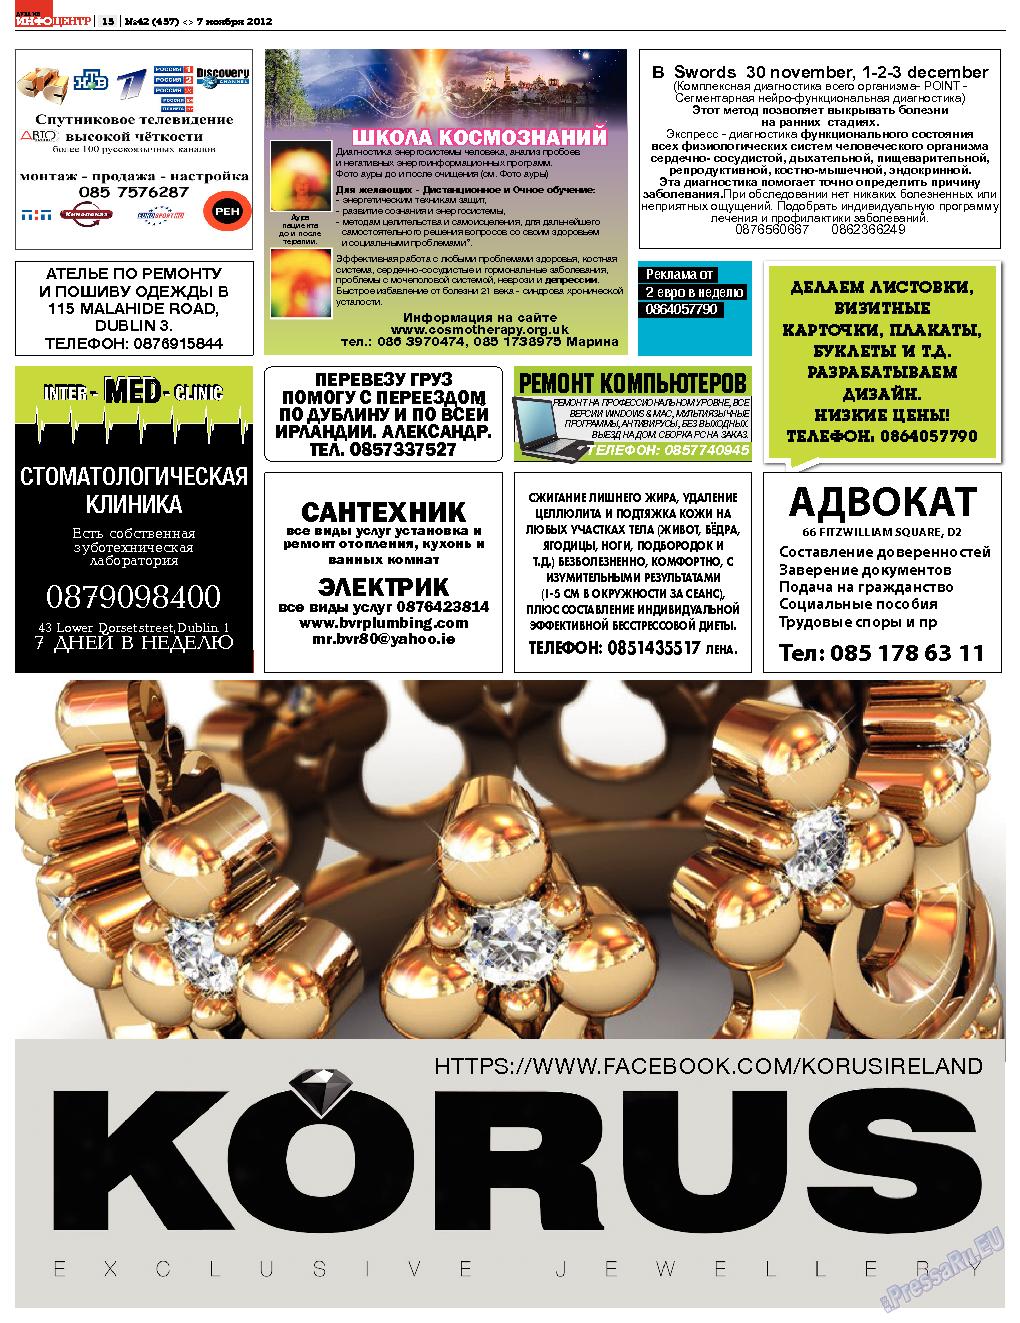 Дублин инфоцентр (газета). 2012 год, номер 42, стр. 15